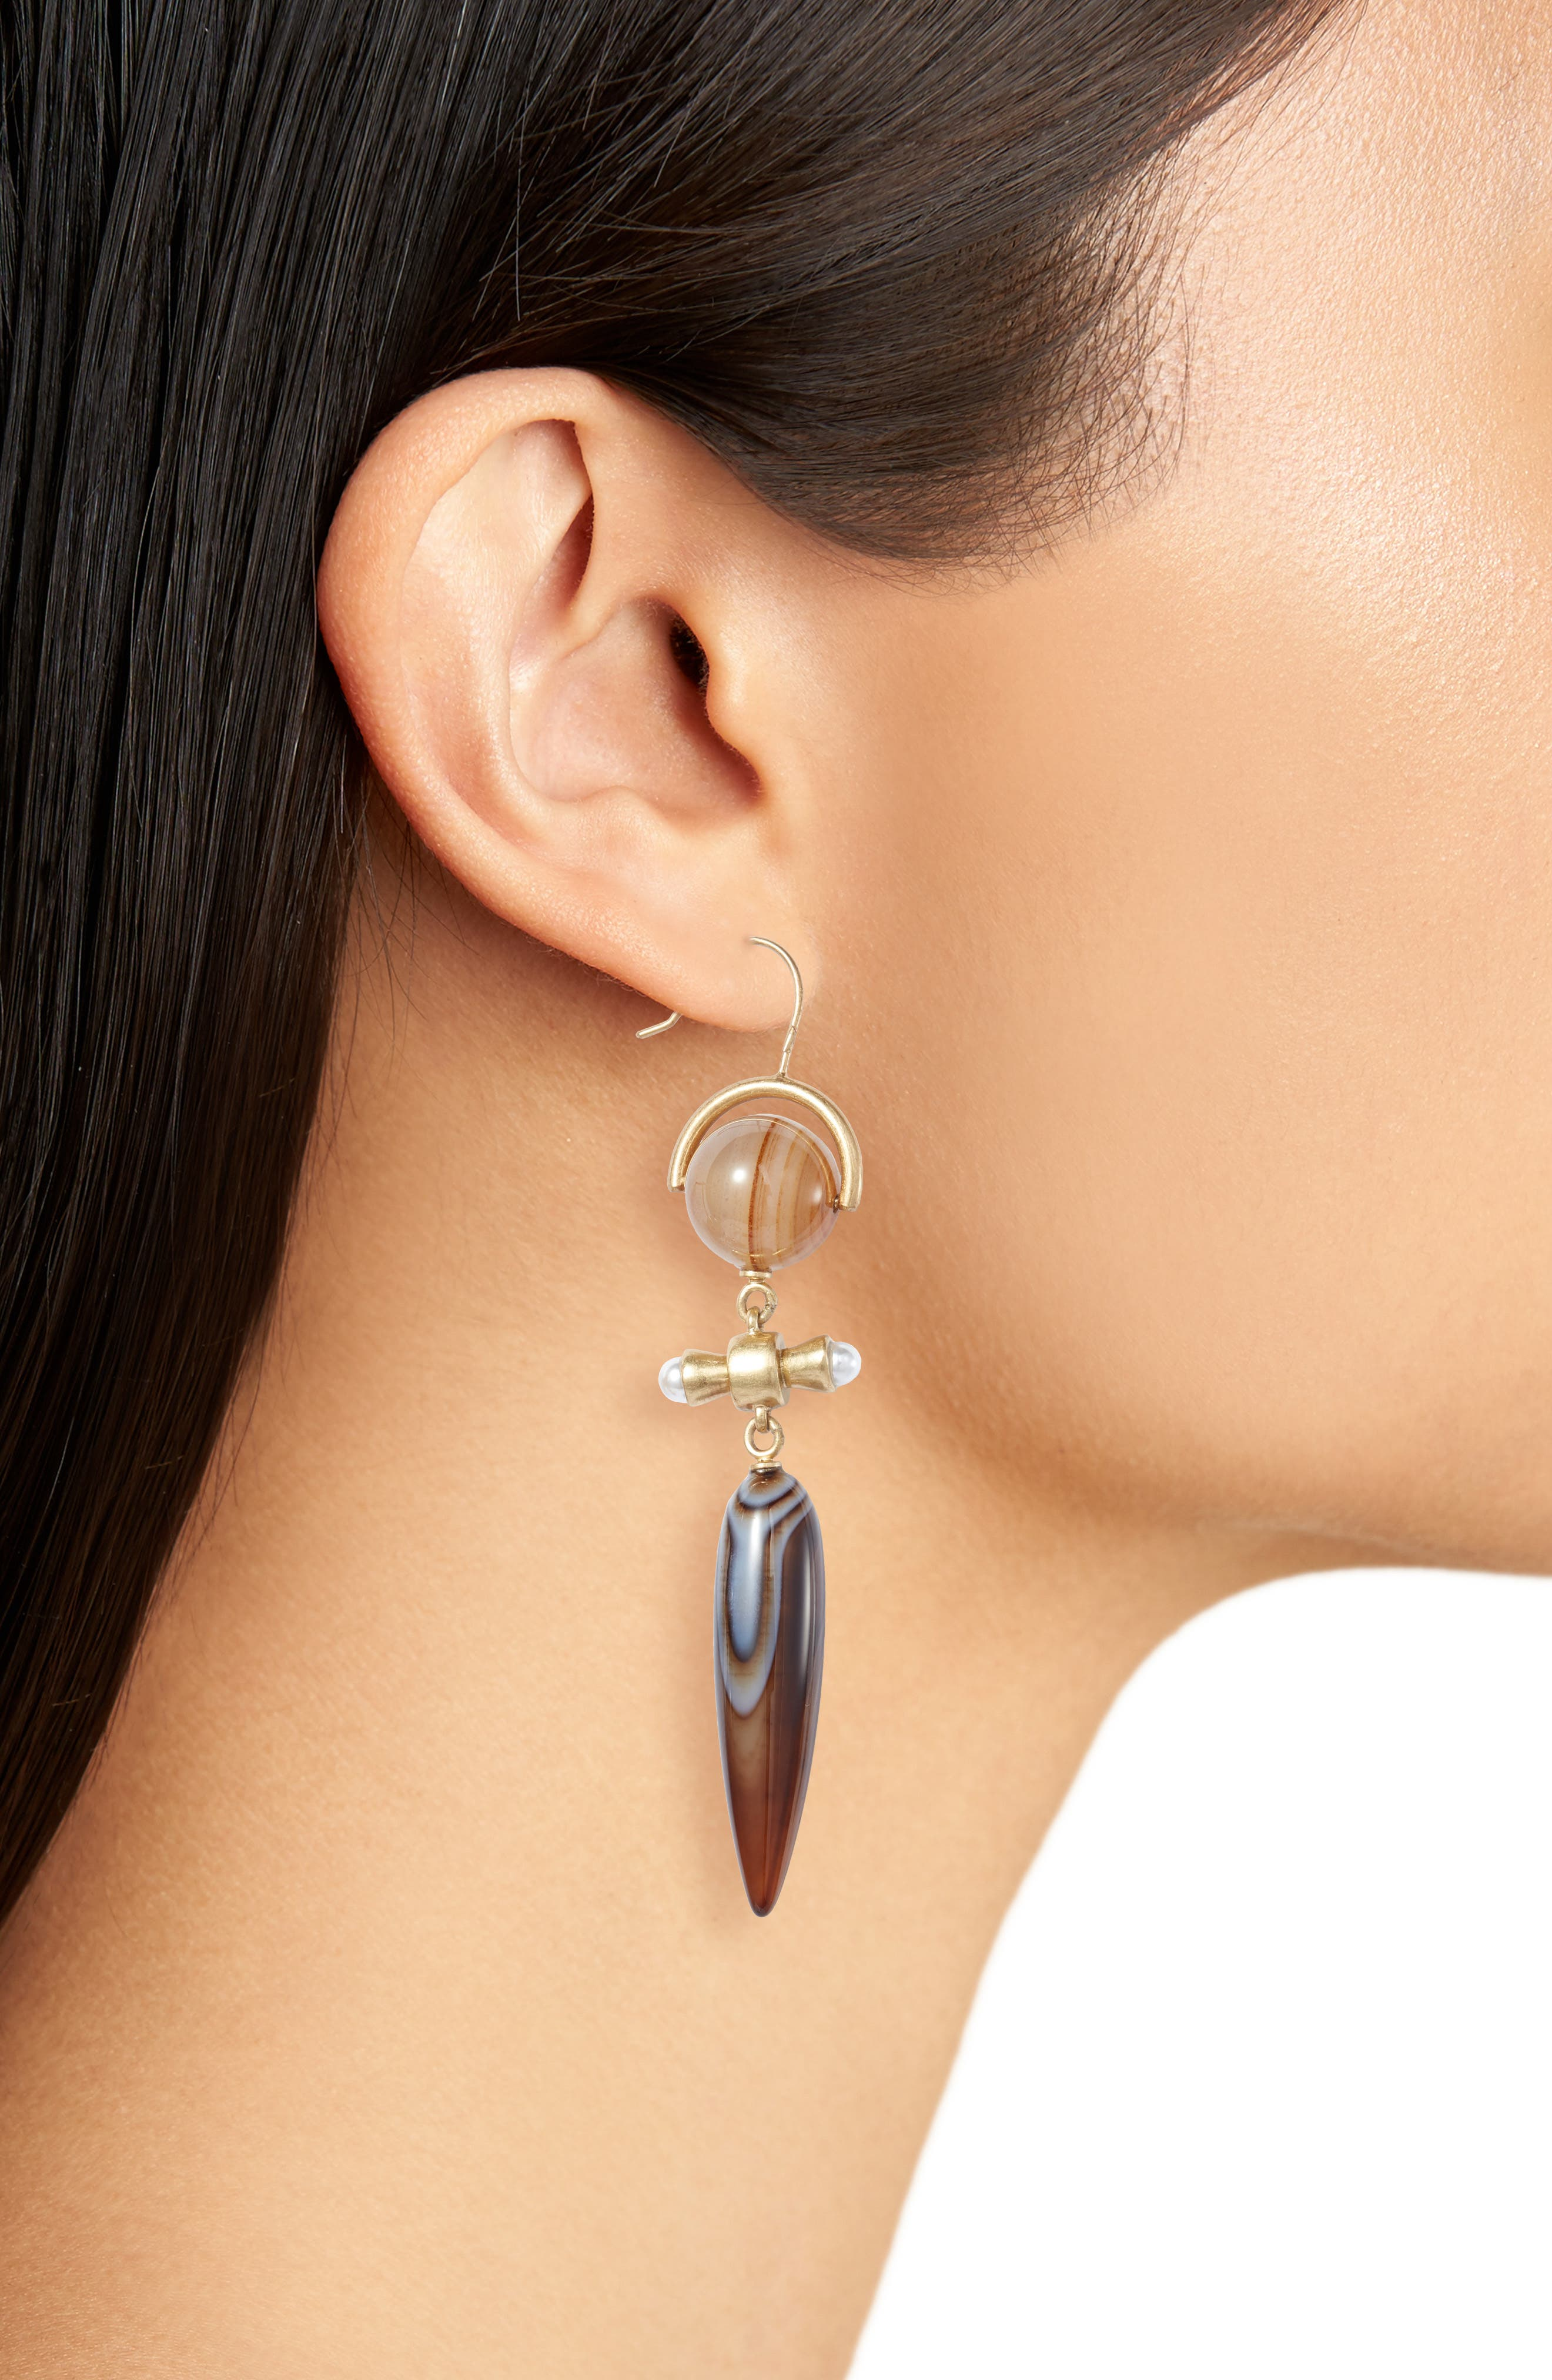 Linear Statement Earrings,                             Alternate thumbnail 2, color,                             AGATE/ BRASS